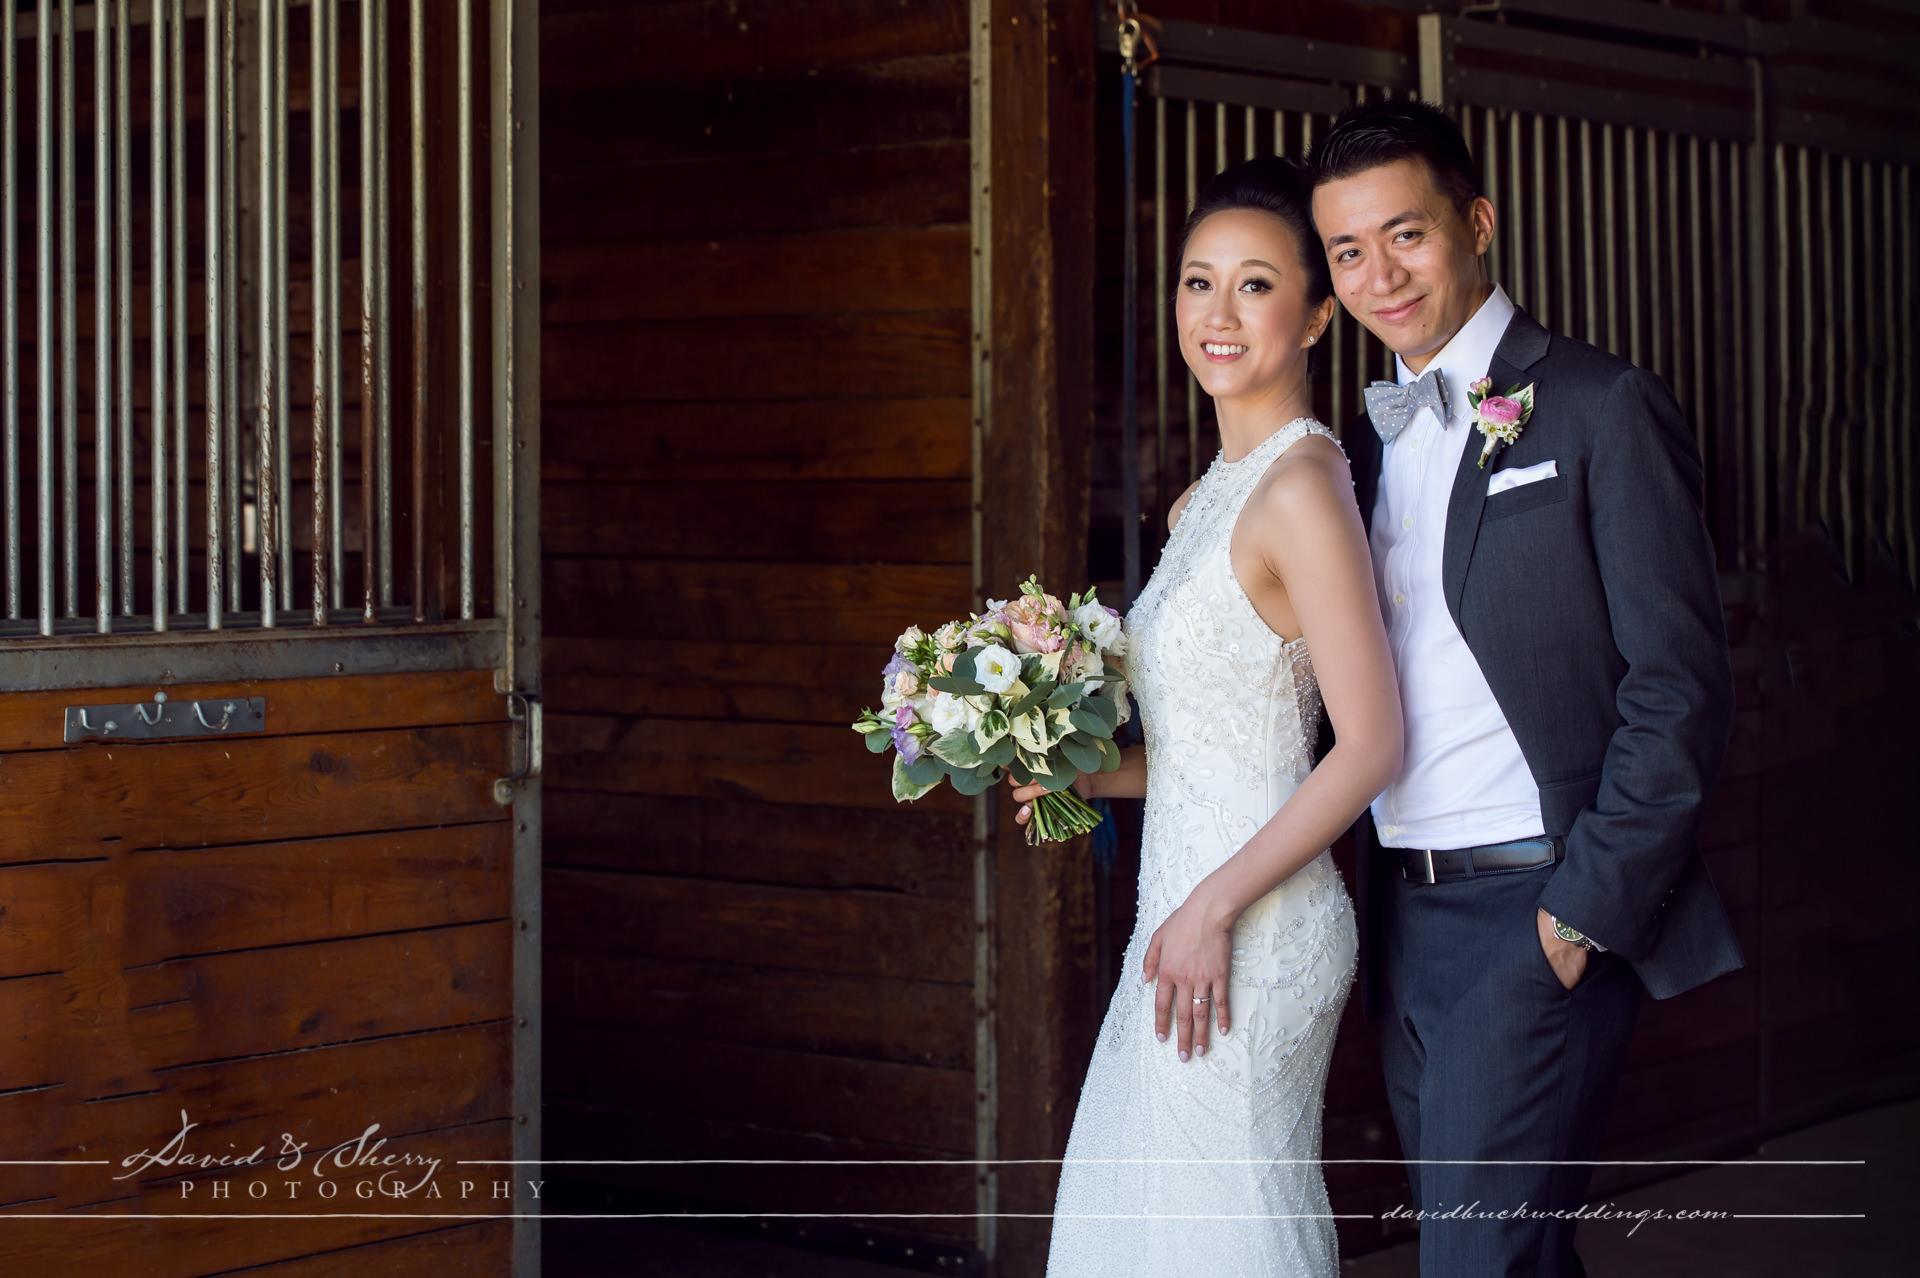 waterstone-estate-wedding-david-sherry-photography-simon-crystal-001